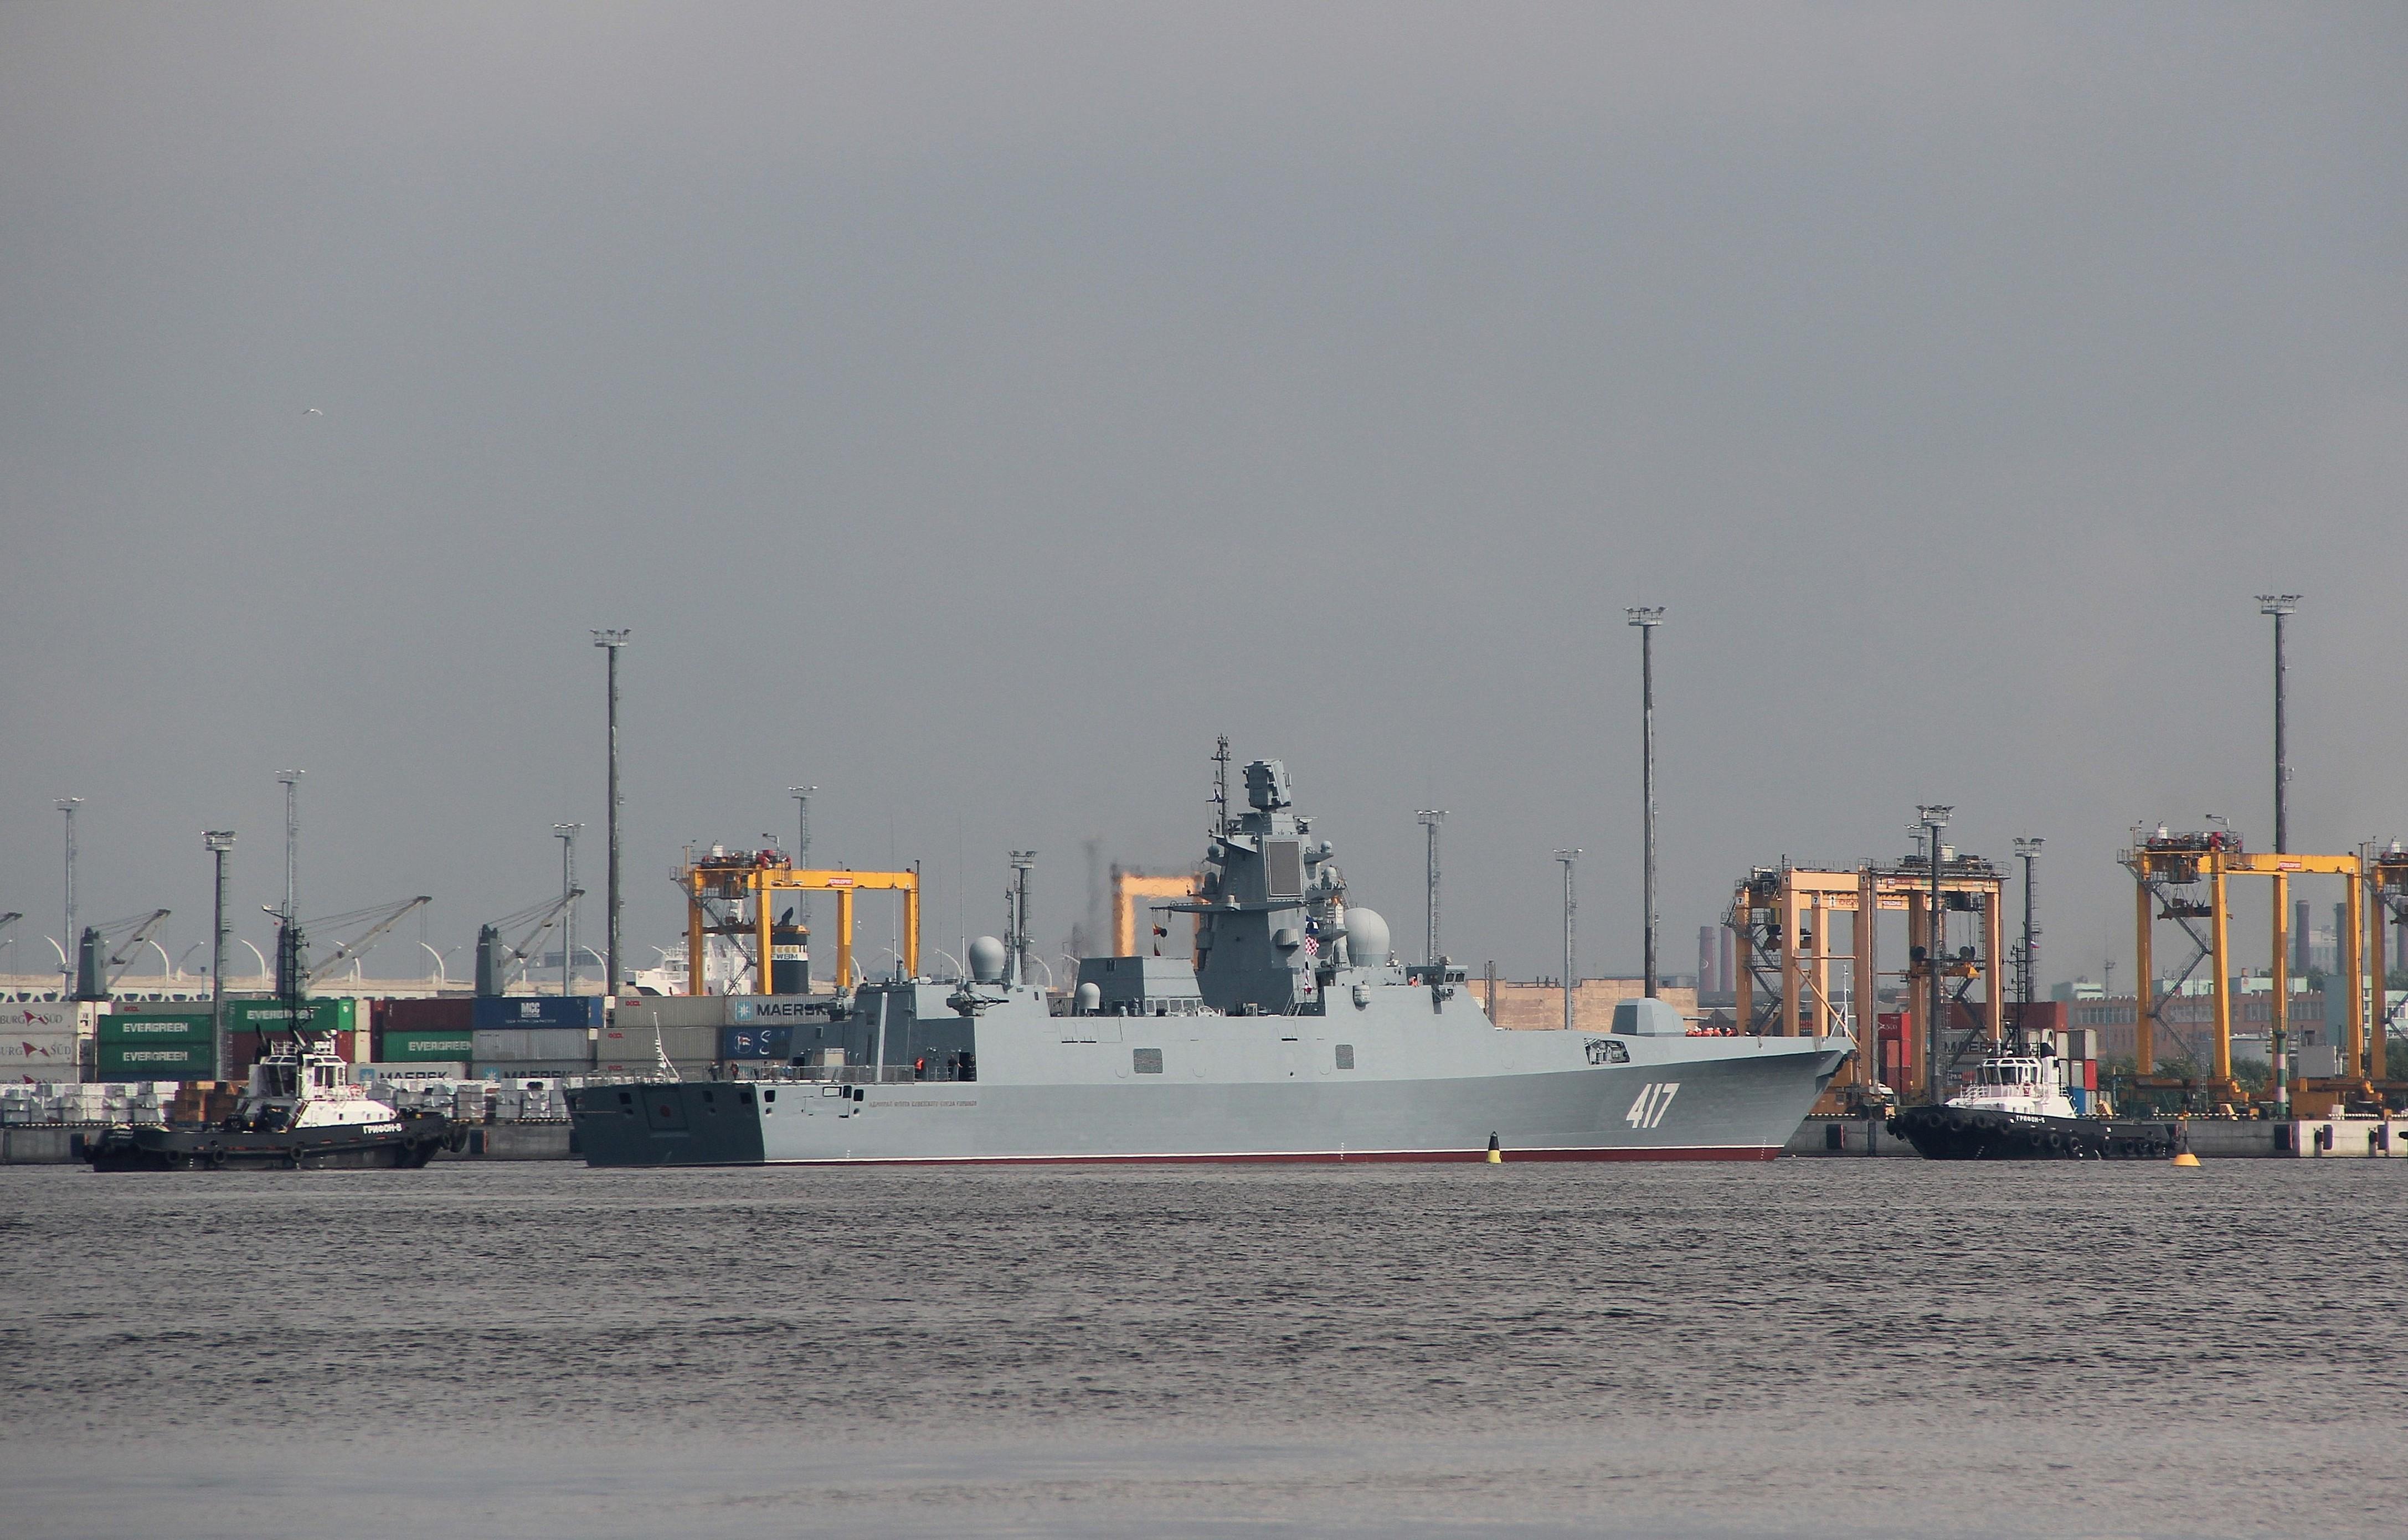 Project 22350: Admiral Sergei Gorshkov - Page 40 23-6501581-22350-admiral-gorshkov-vkhod-na-sv-22.07.2018